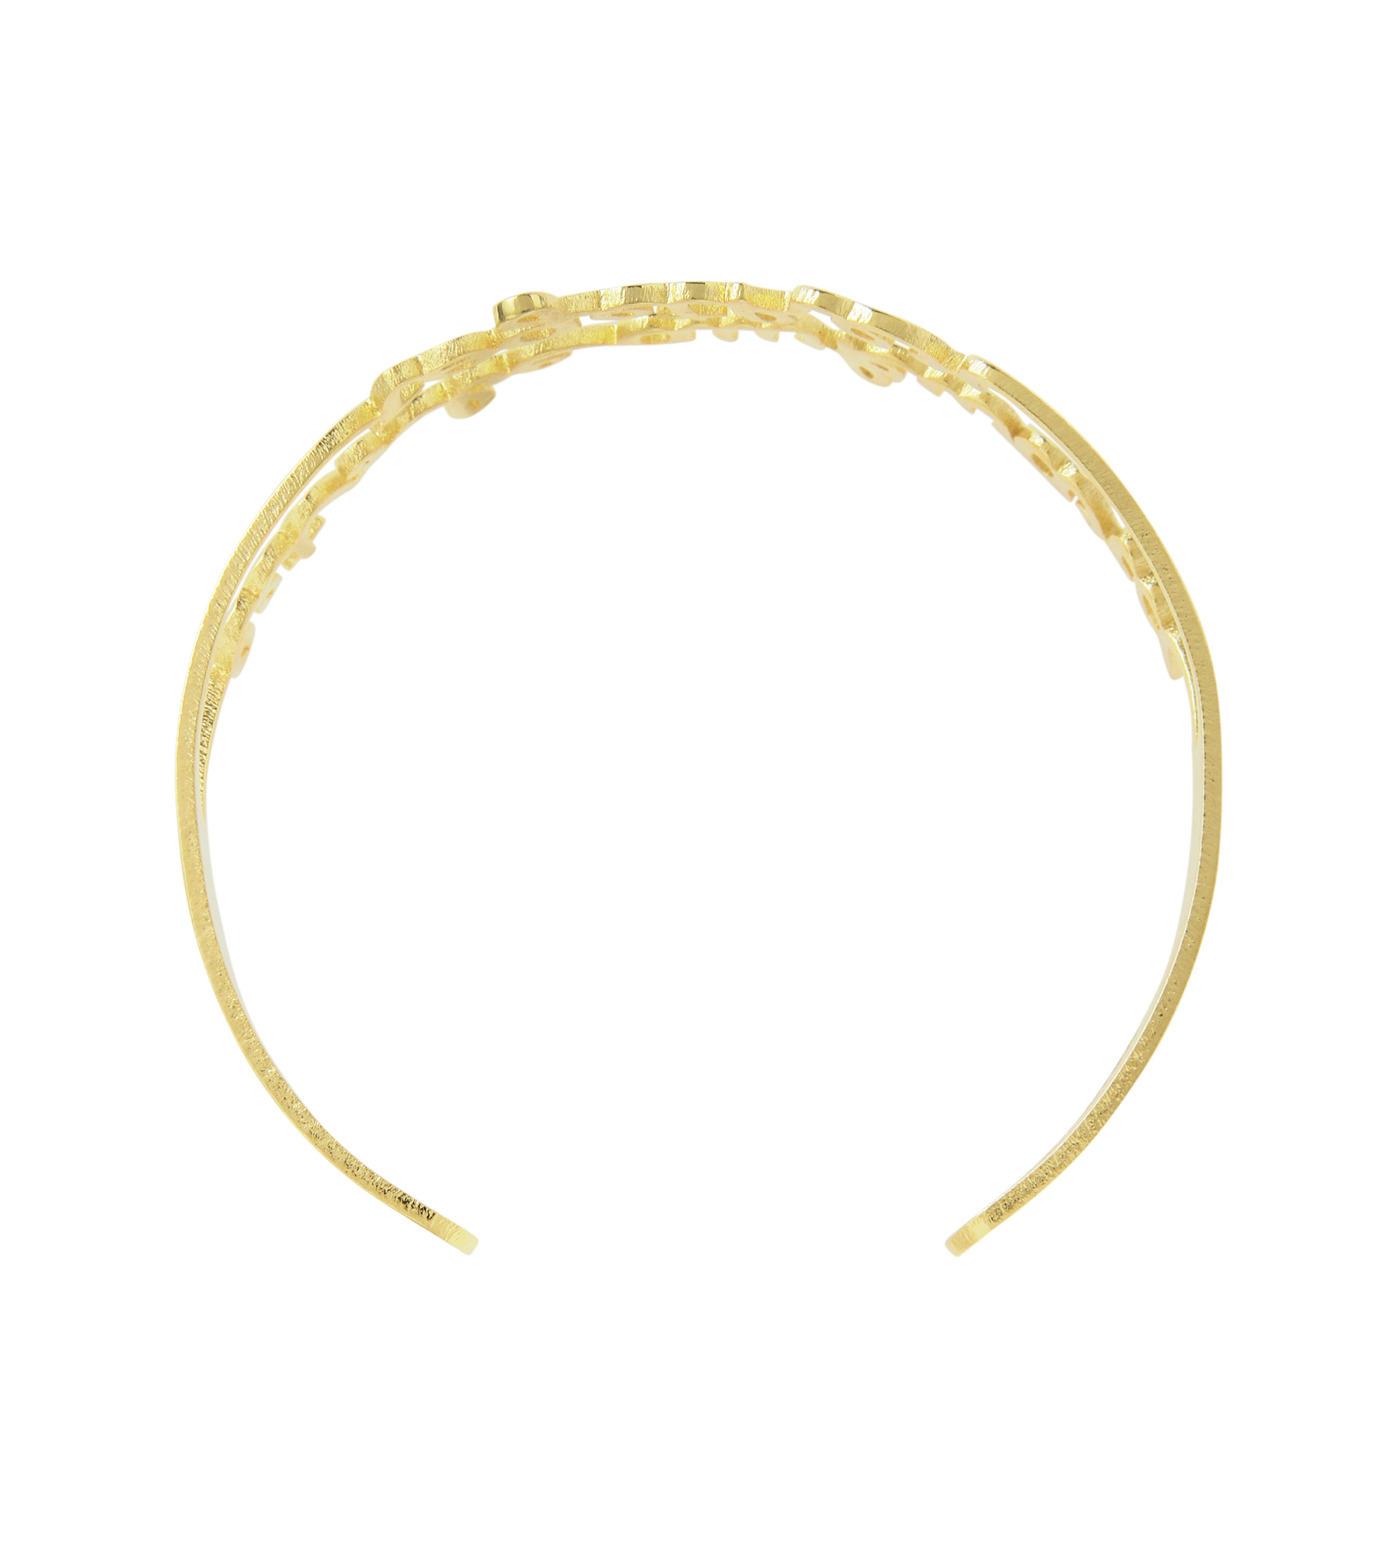 VANINA(バニーナ)のLike Deserts miss Rain Bracelet-GOLD(アクセサリー/accessory)-LIKE-Dese-L 拡大詳細画像3